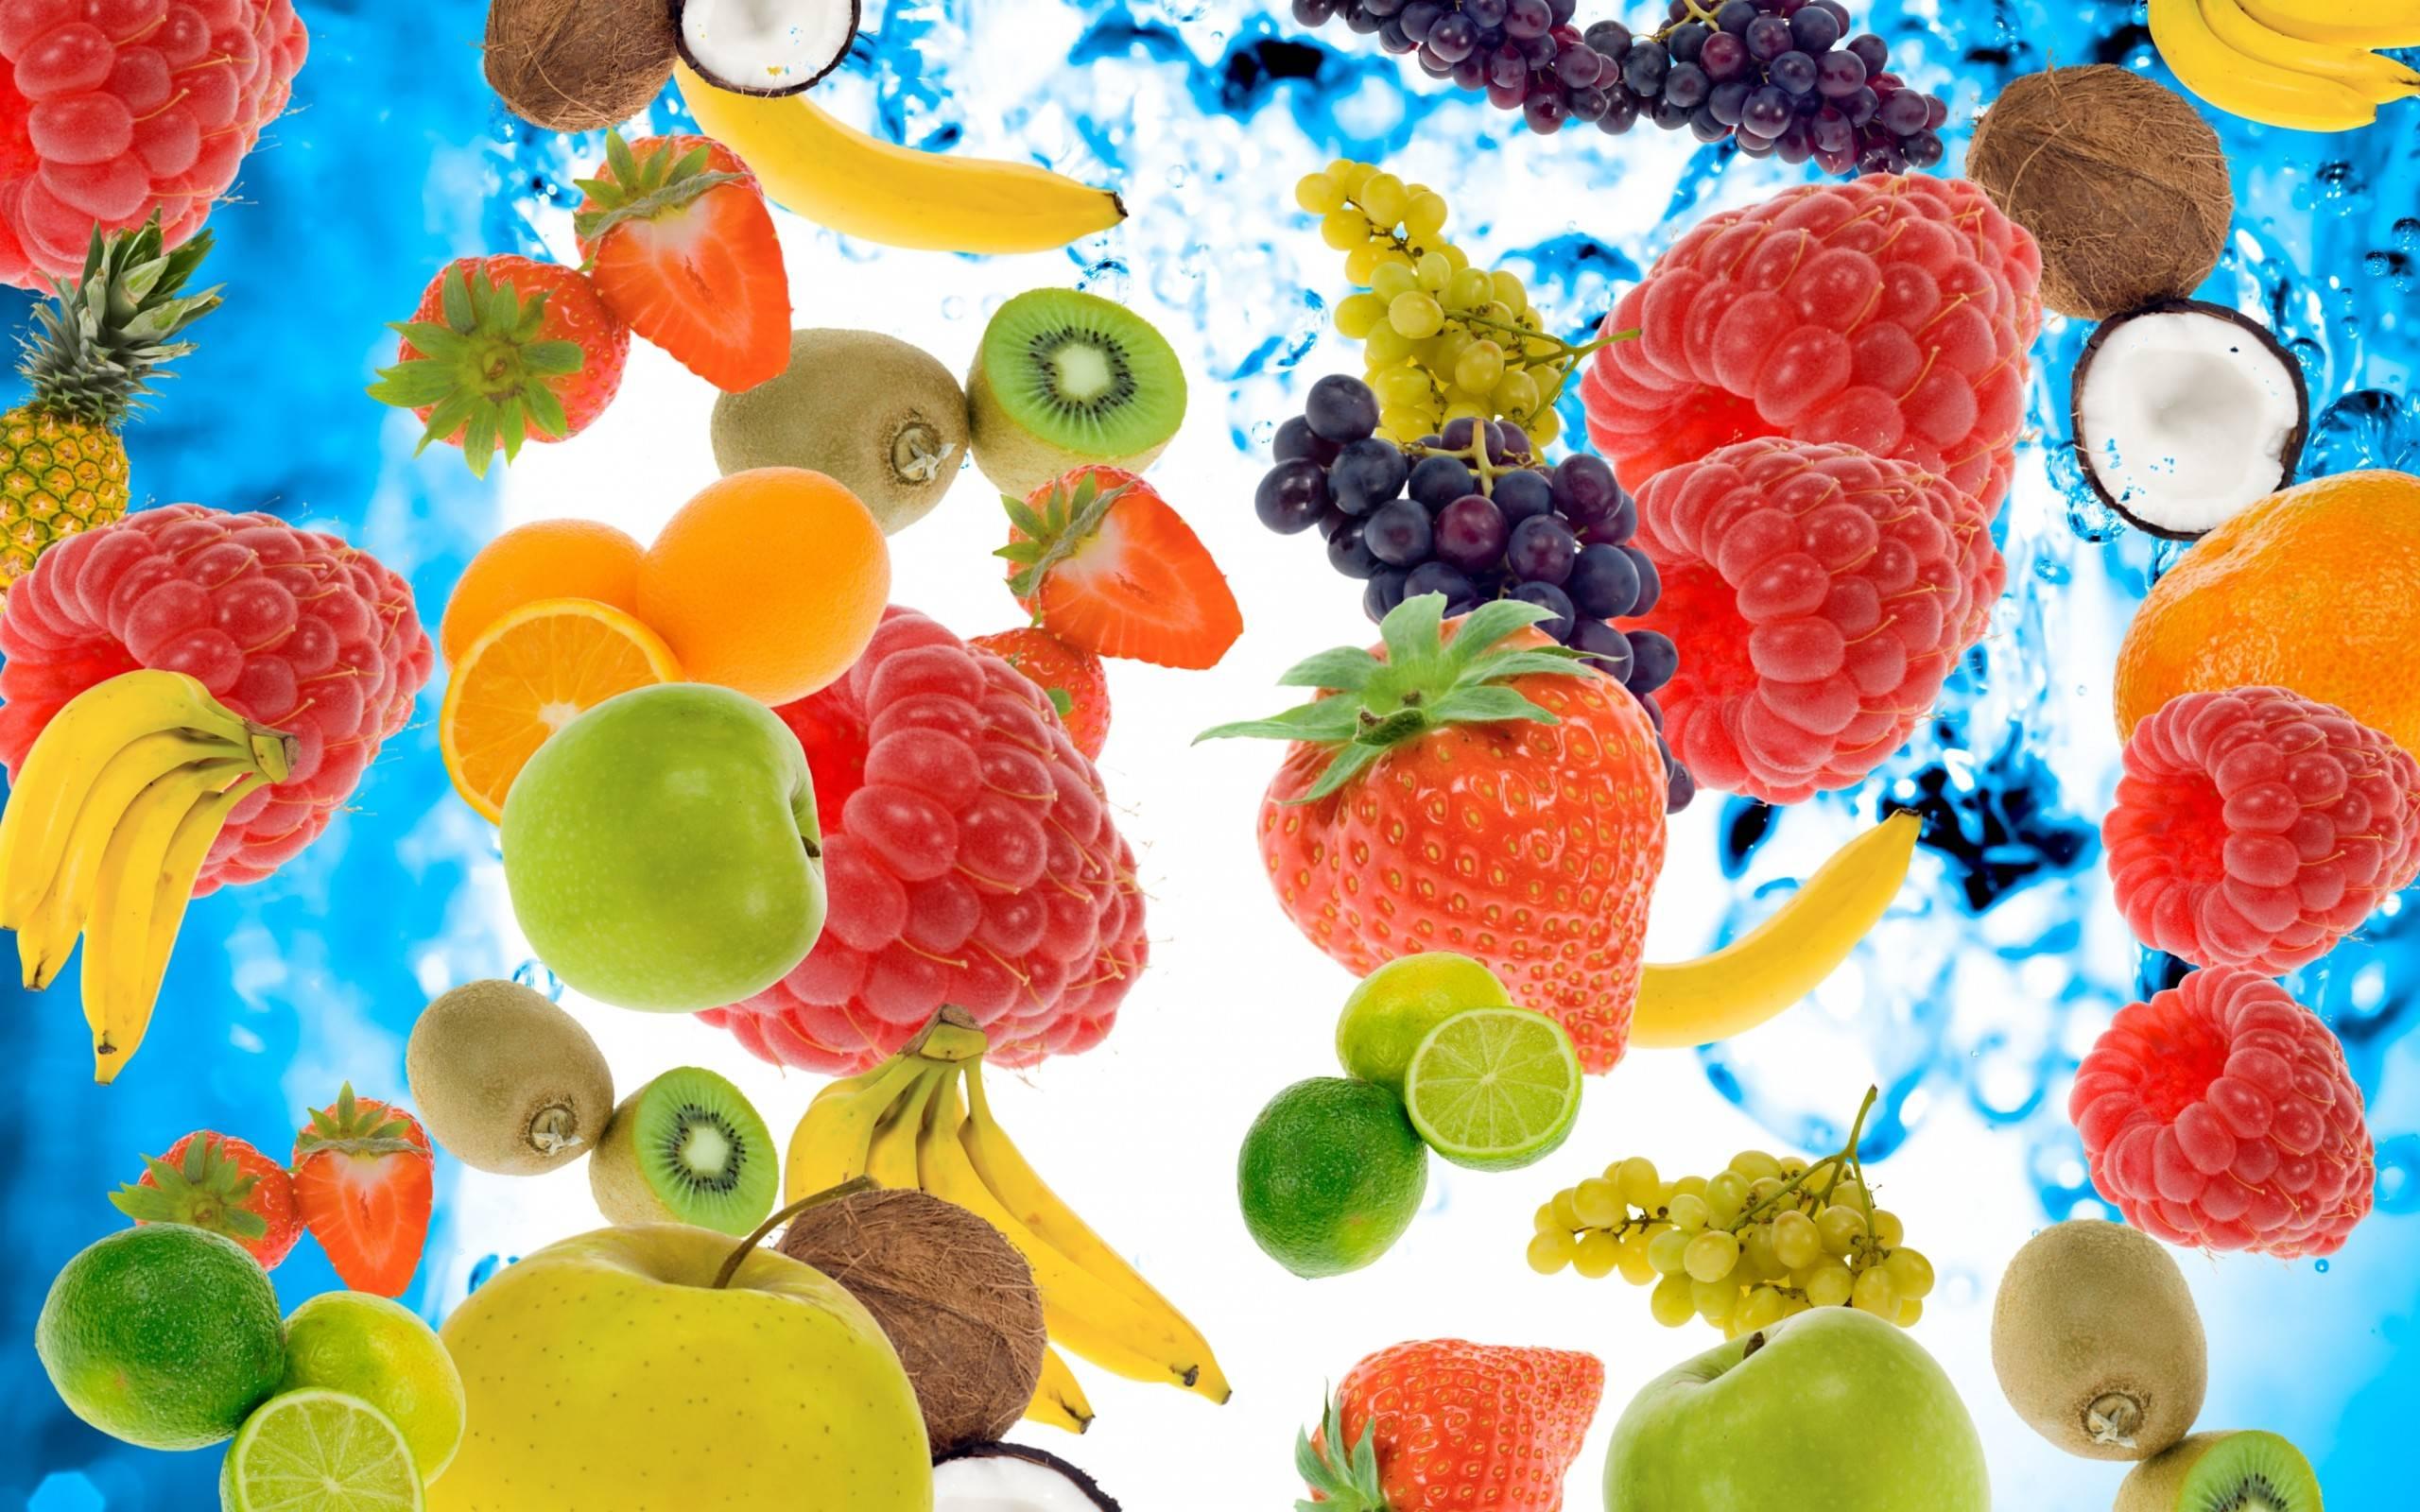 Summer Fruit Wallpapers   Top Summer Fruit Backgrounds 2560x1600